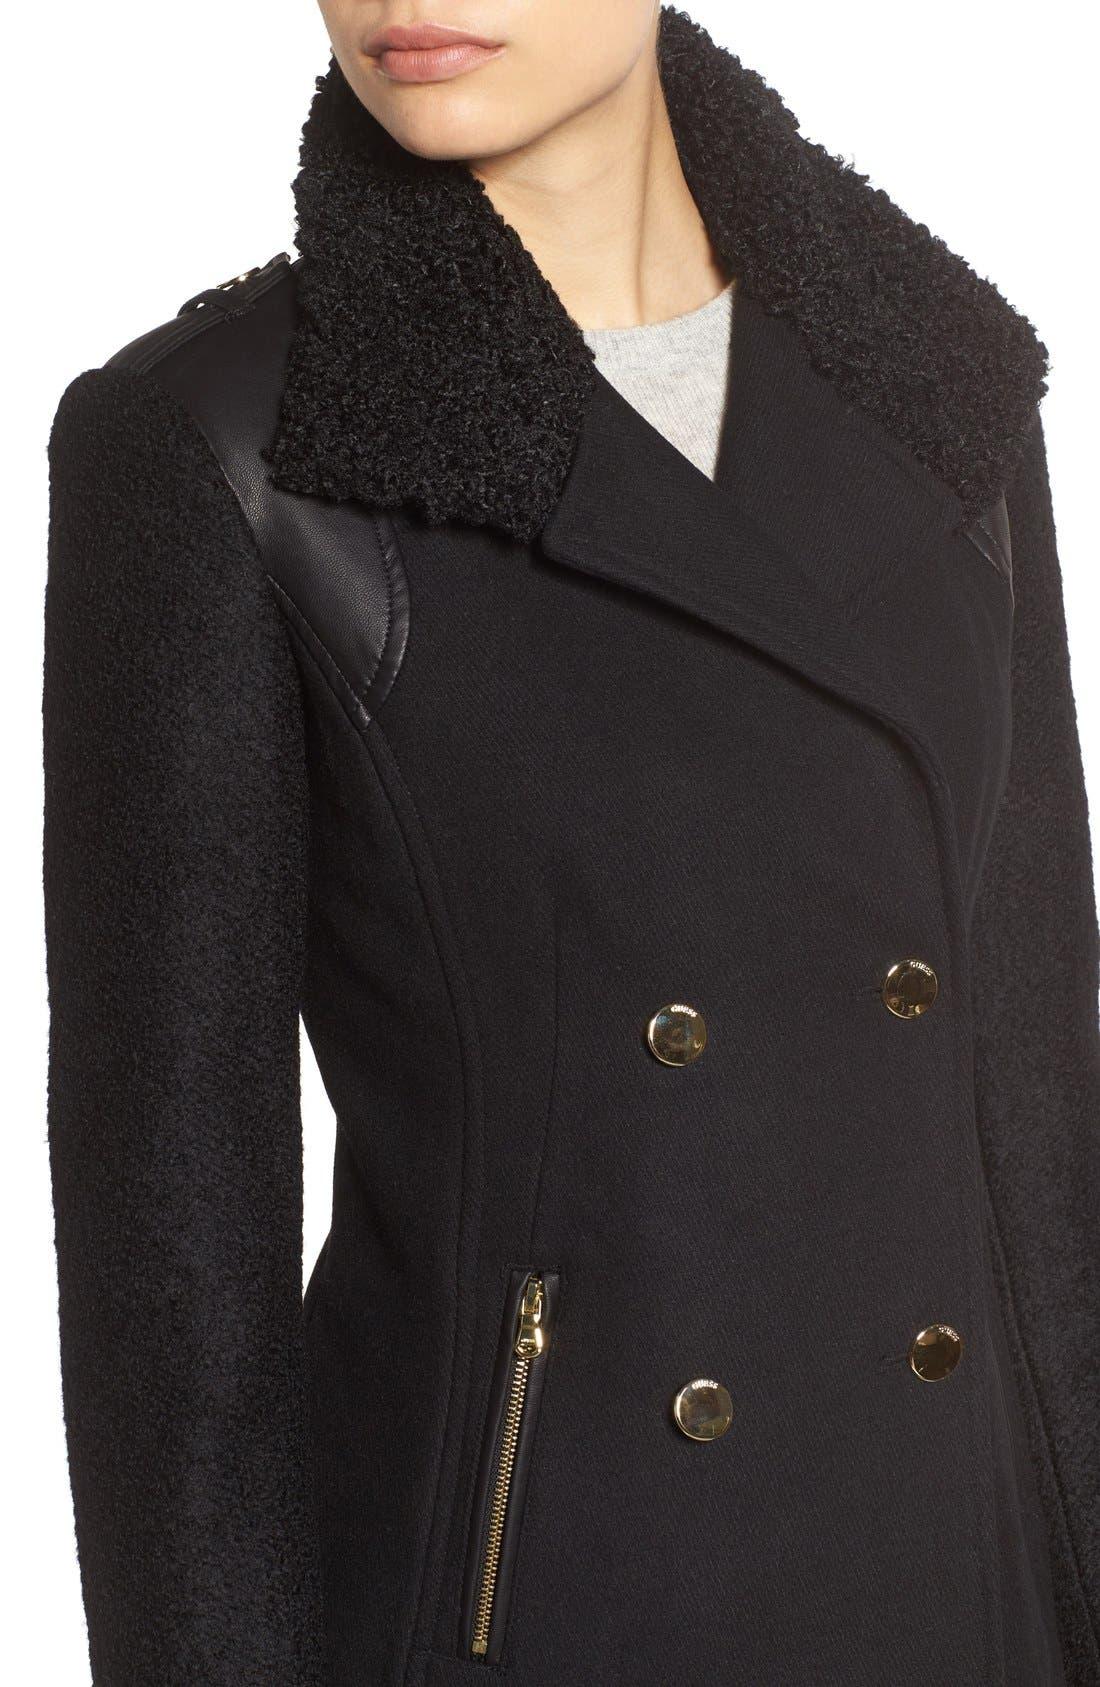 Bouclé Sleeve Wool Blend Military Coat,                             Alternate thumbnail 3, color,                             001